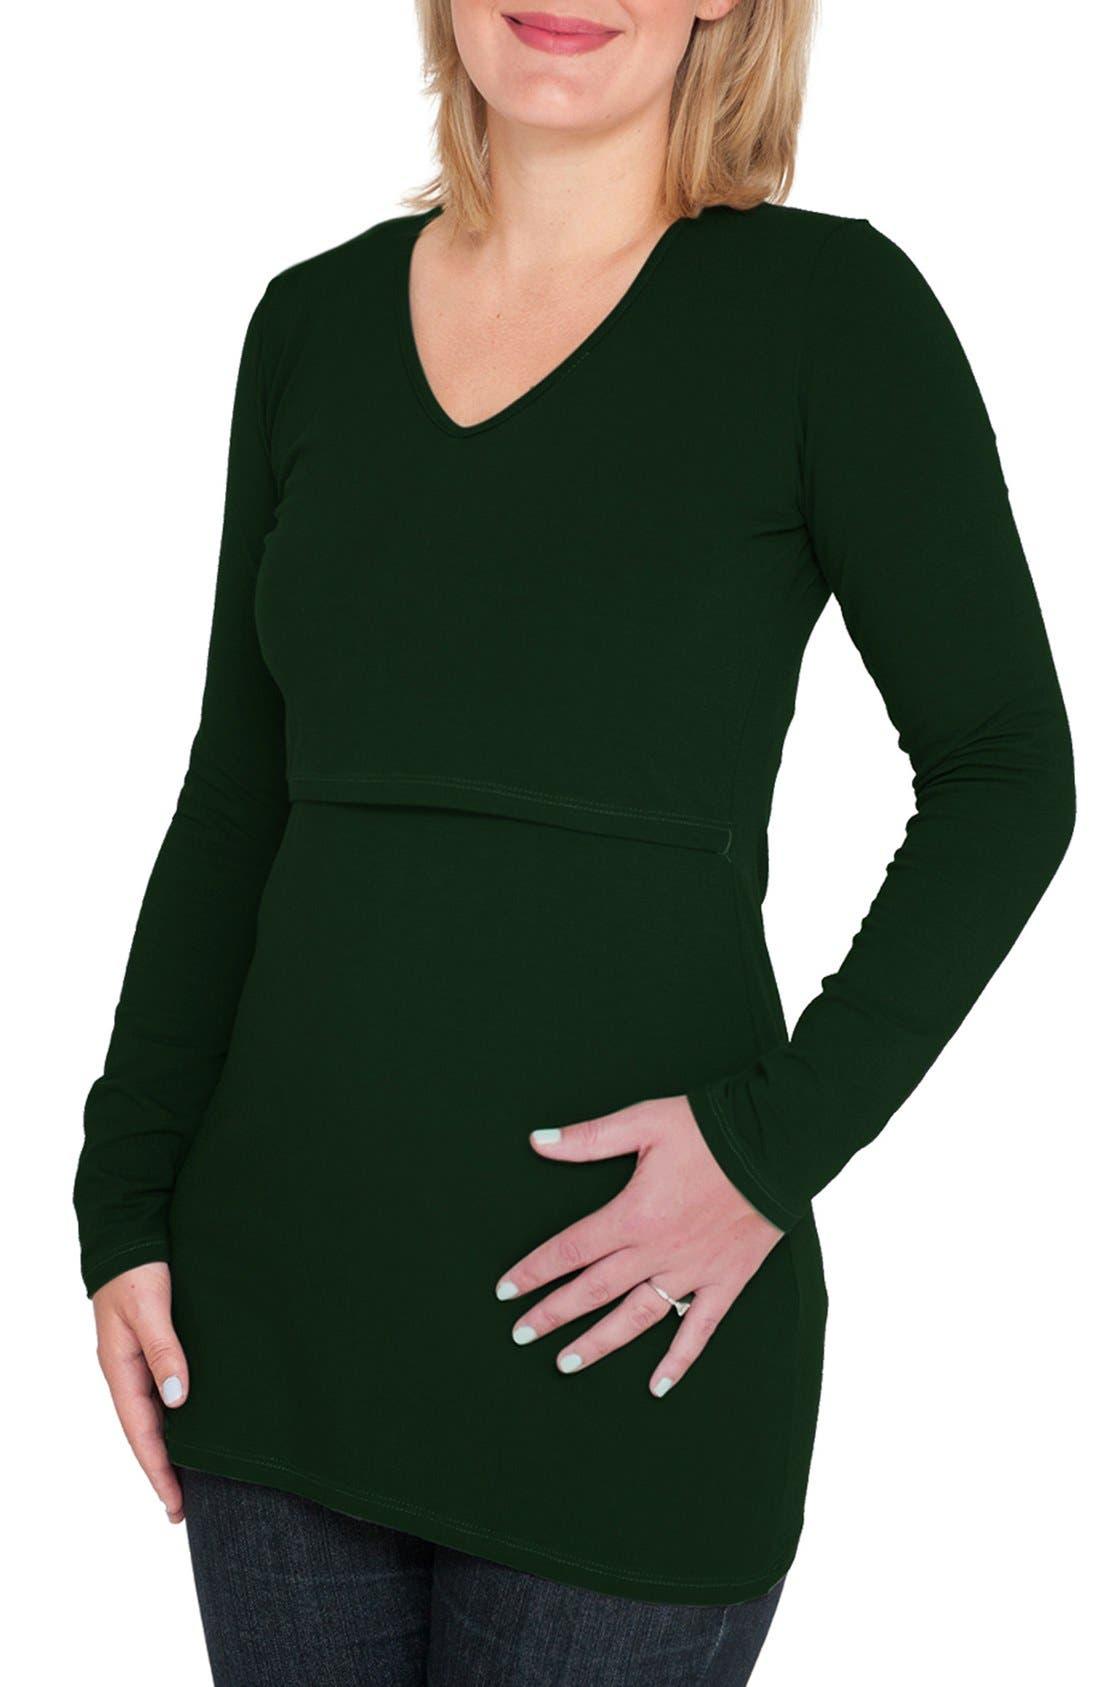 Long Sleeve Nursing Maternity Tee,                             Main thumbnail 1, color,                             Green Forest